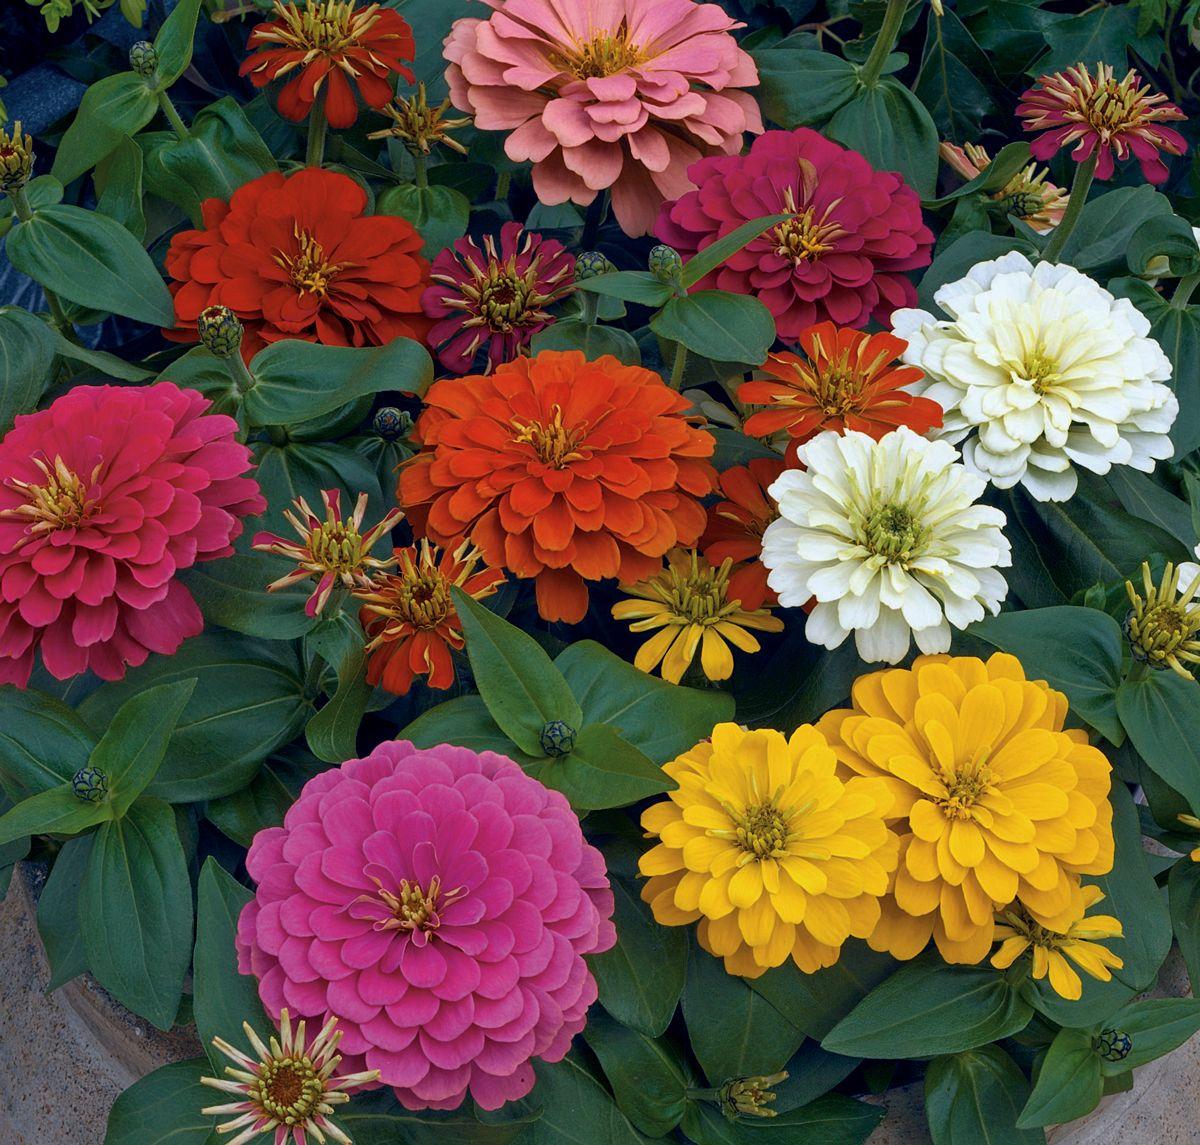 Zinnia Mixed pohlmansnursery pohlmans zinnia flowers